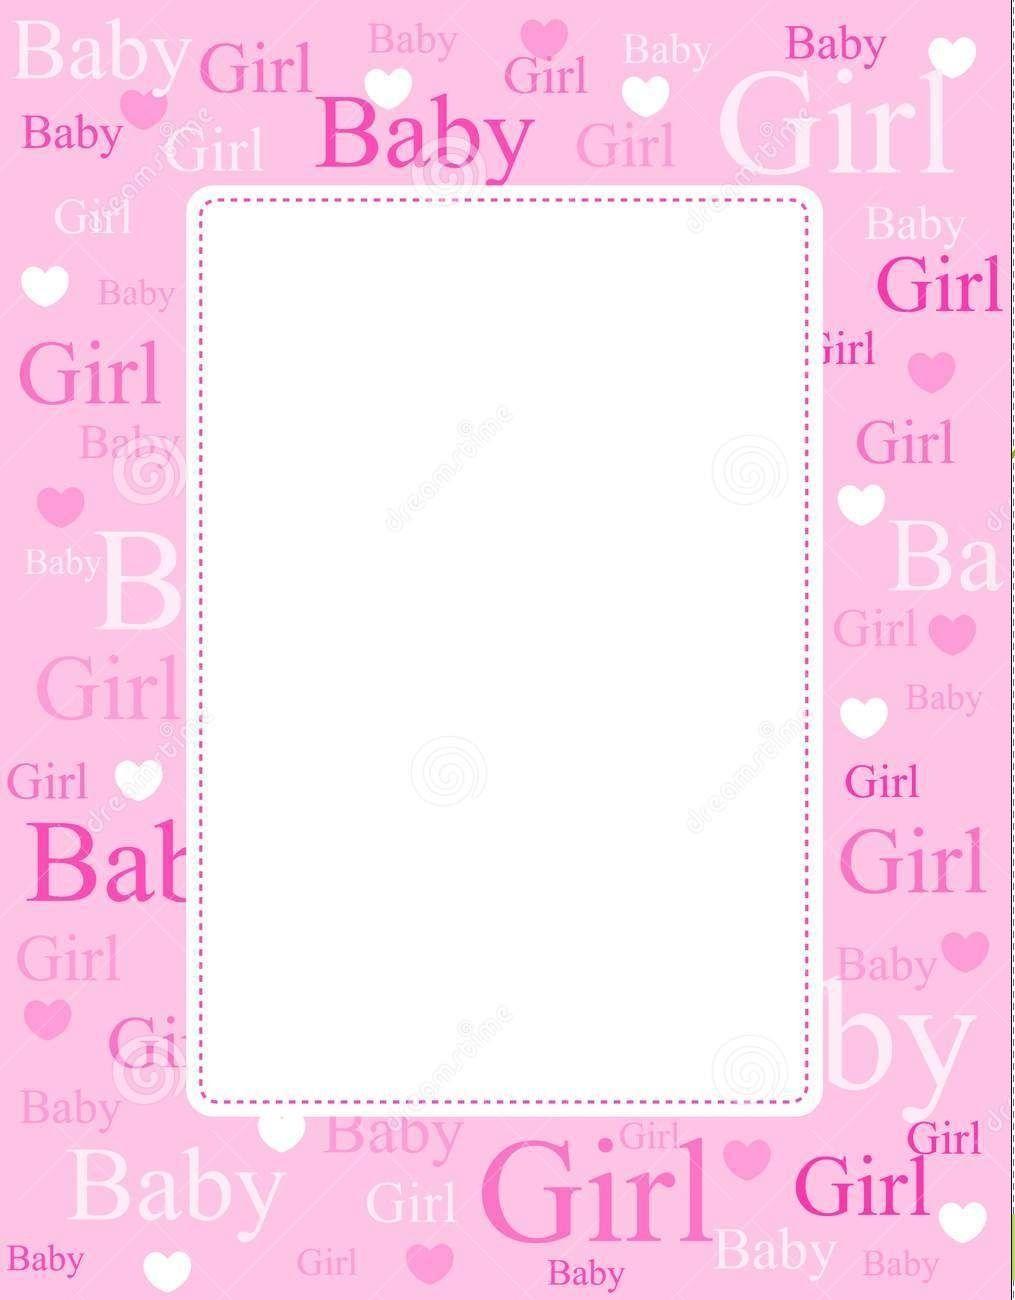 Get Baby Girl First Baby Shower Invitation Ideas Free Printable Baby Shower Invitations Printable Baby Shower Invitations Free Baby Shower Invitations